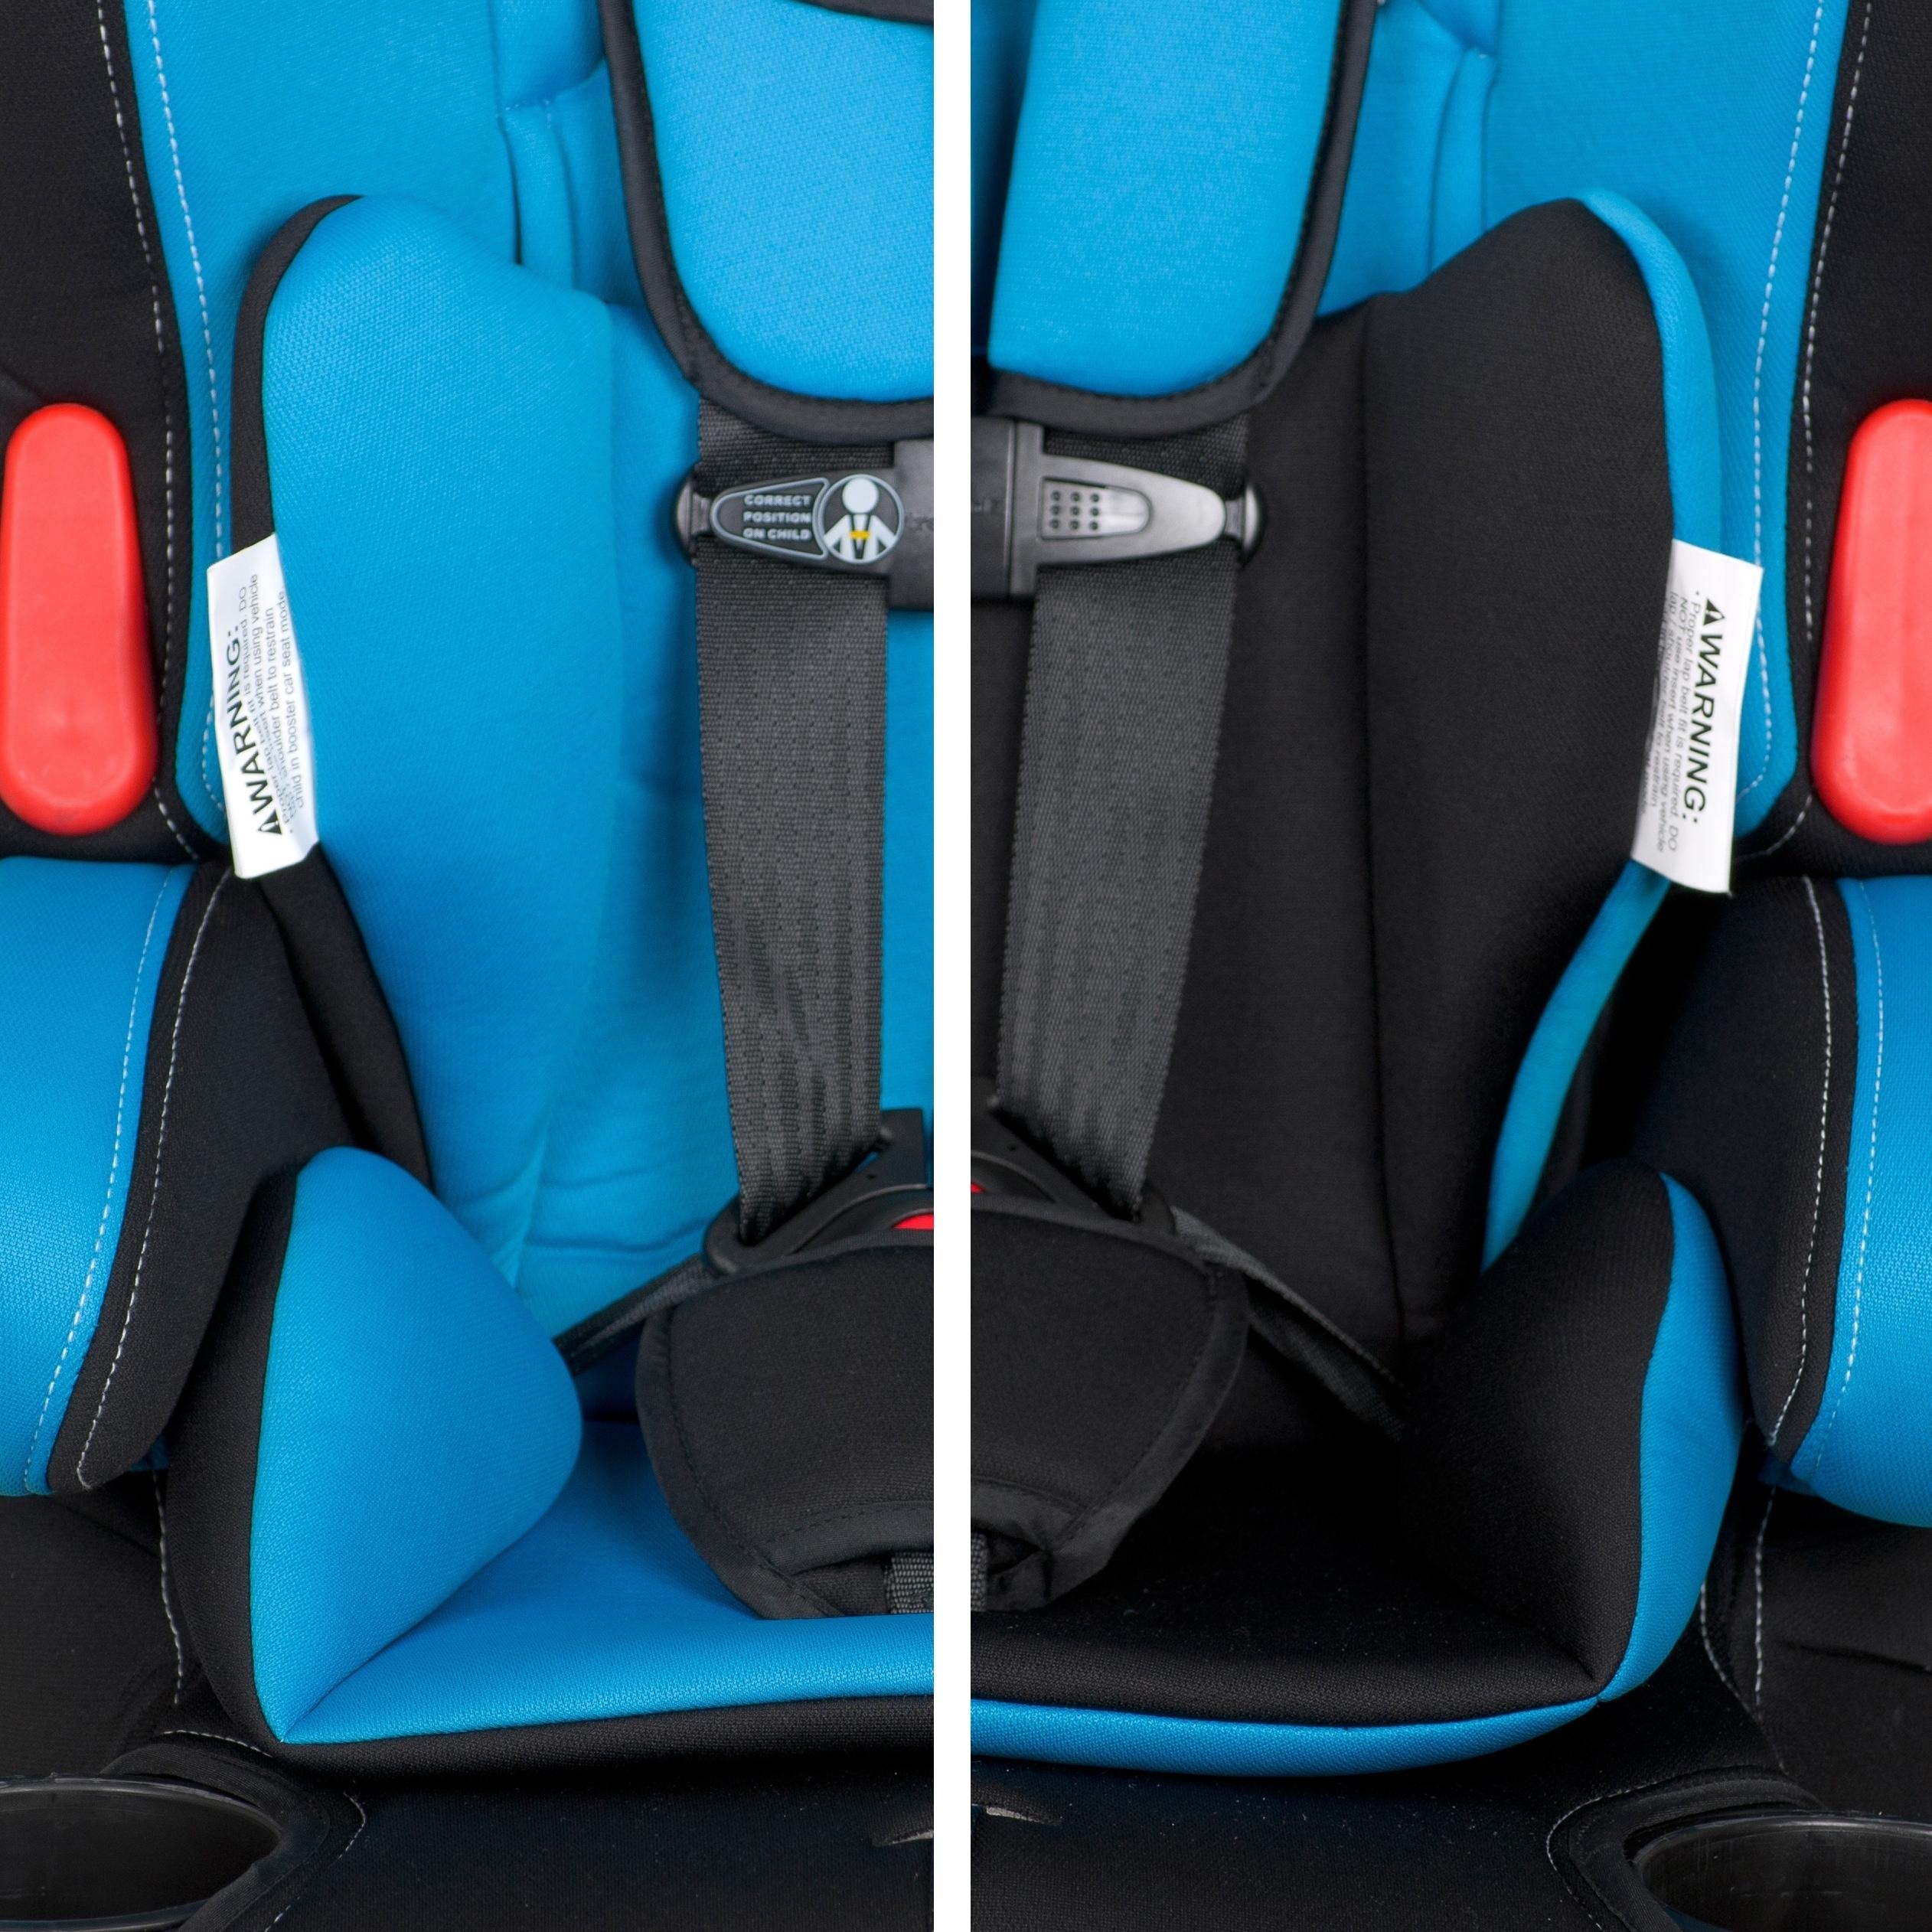 Shop Baby Trend Hybrid 3 In 1 Car Seat Blue Moon